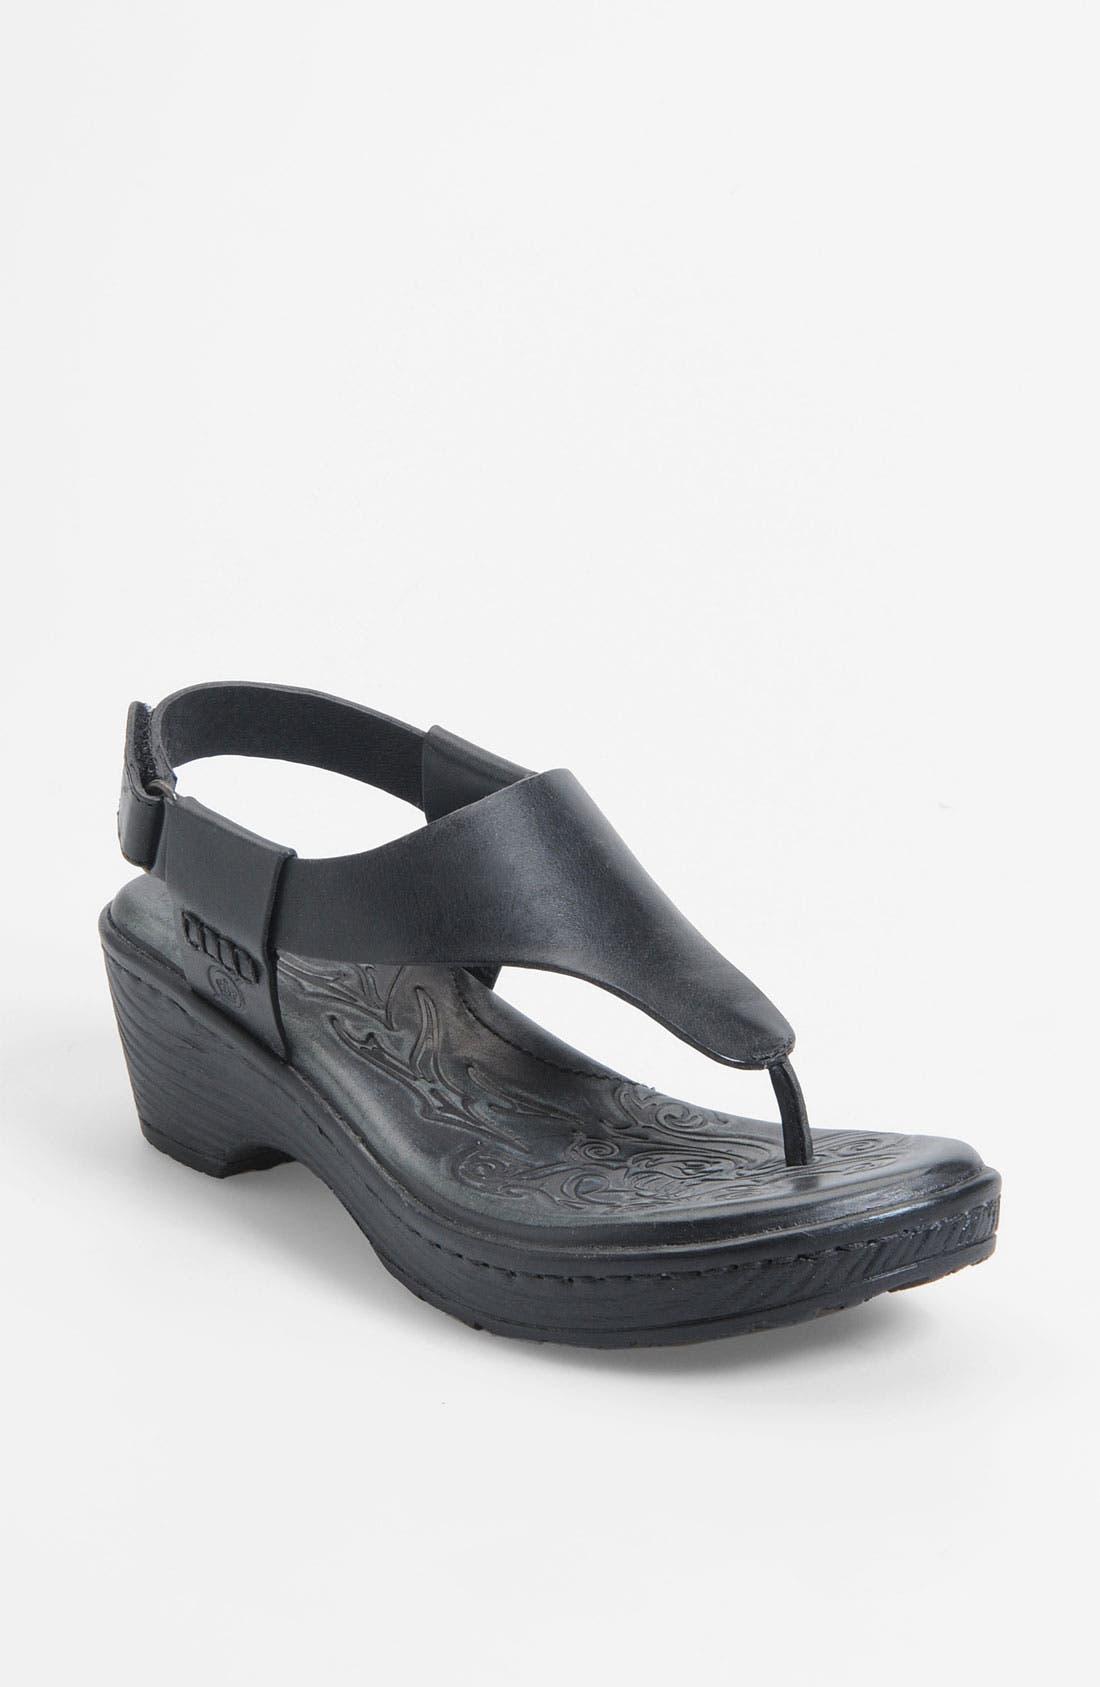 Alternate Image 1 Selected - Børn 'Daya' Sandal